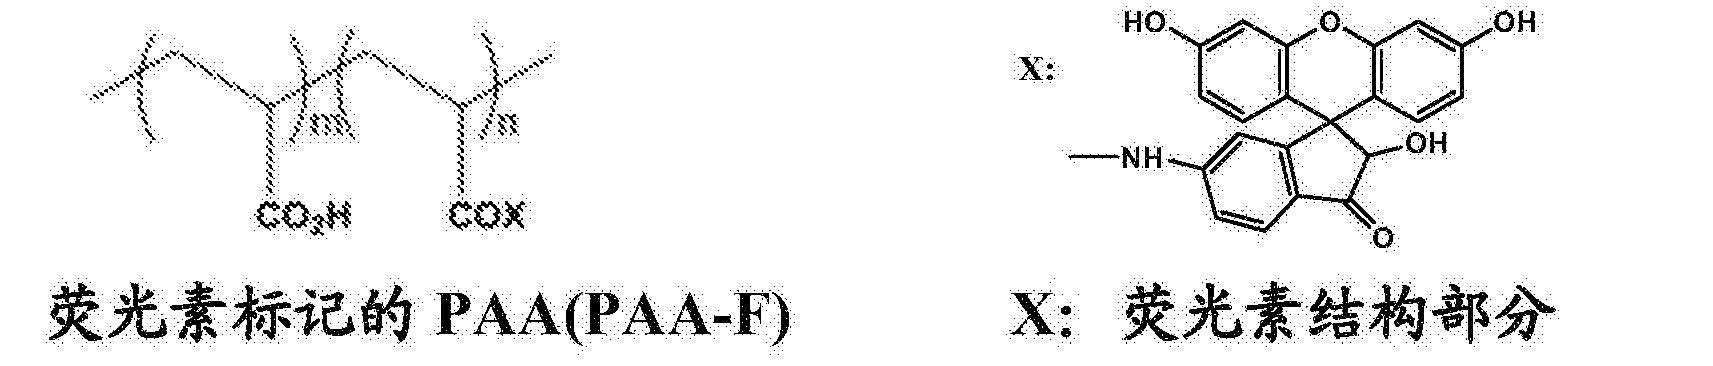 Figure CN106896422AD00341